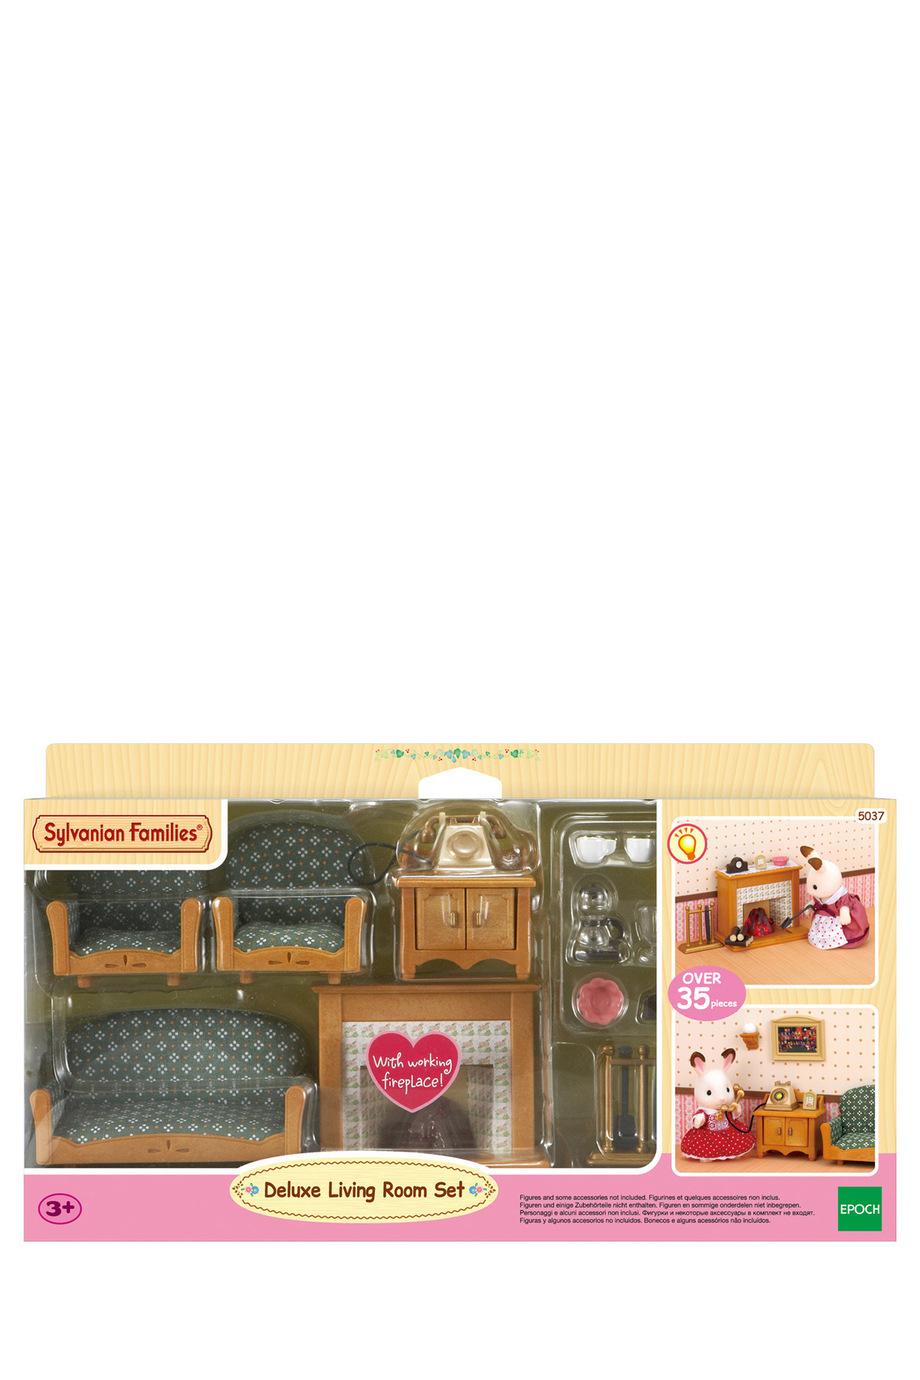 NEW Sylvanian Families Deluxe Living Room Set EBay